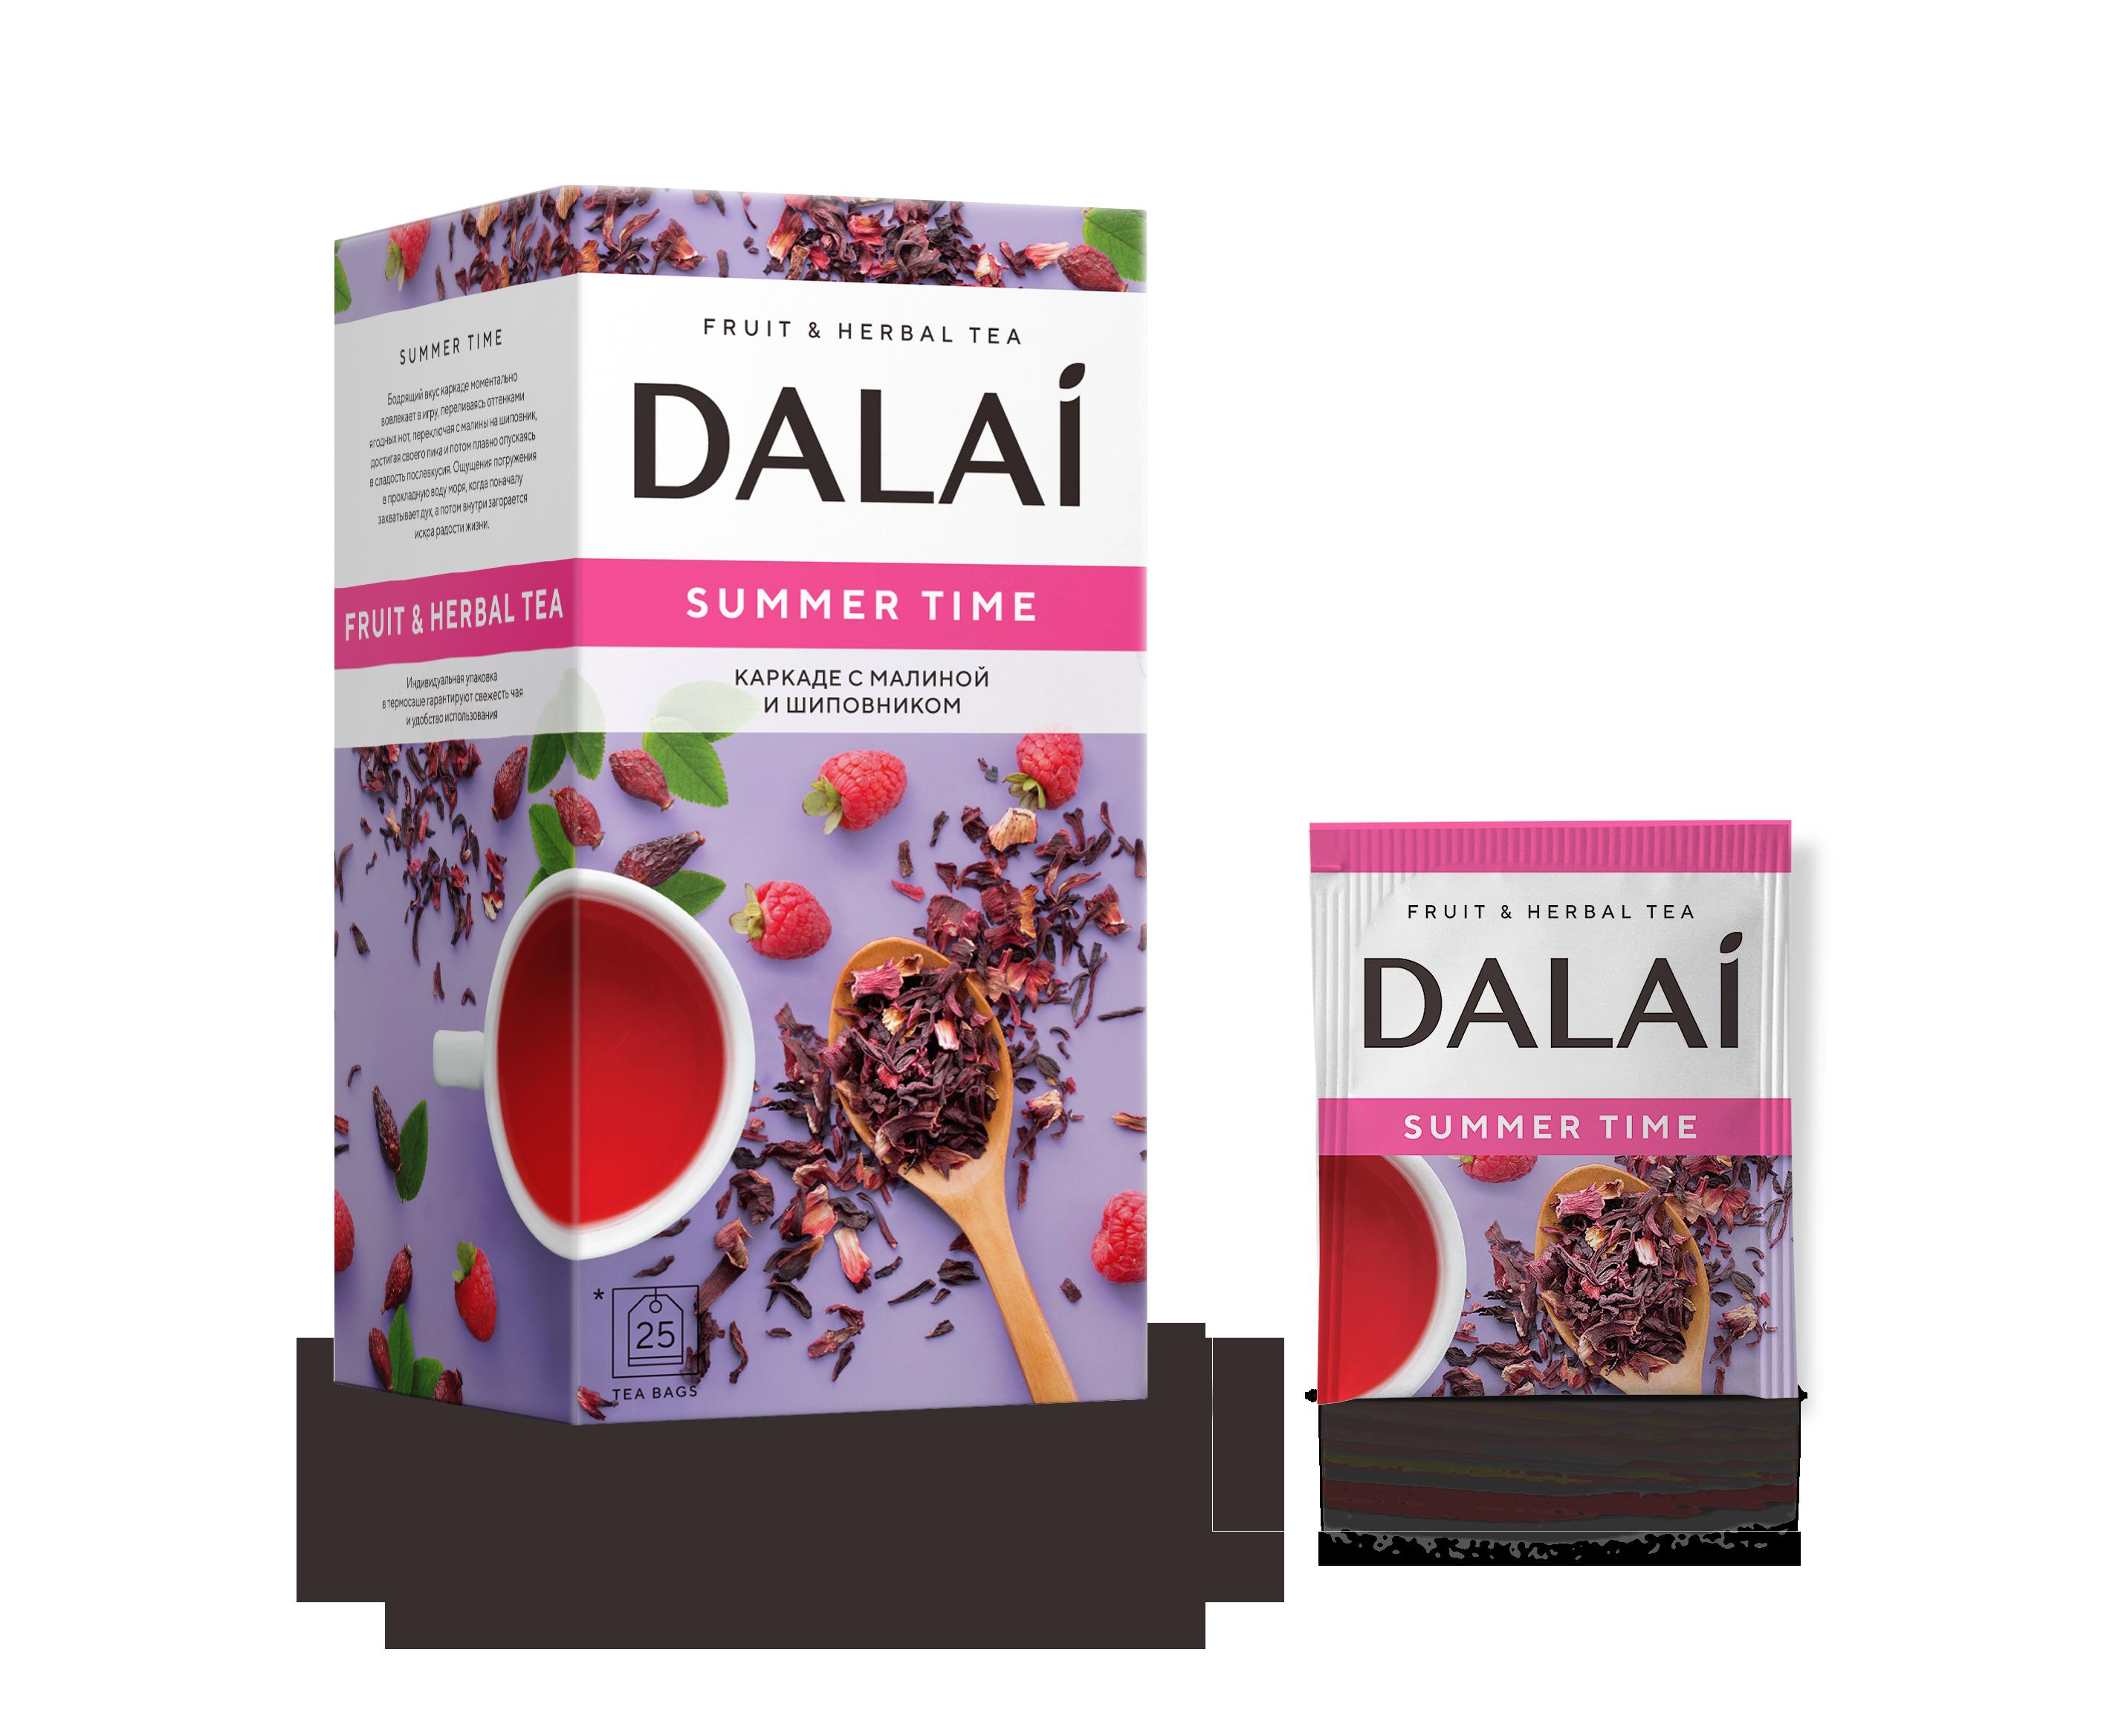 dalai summer time